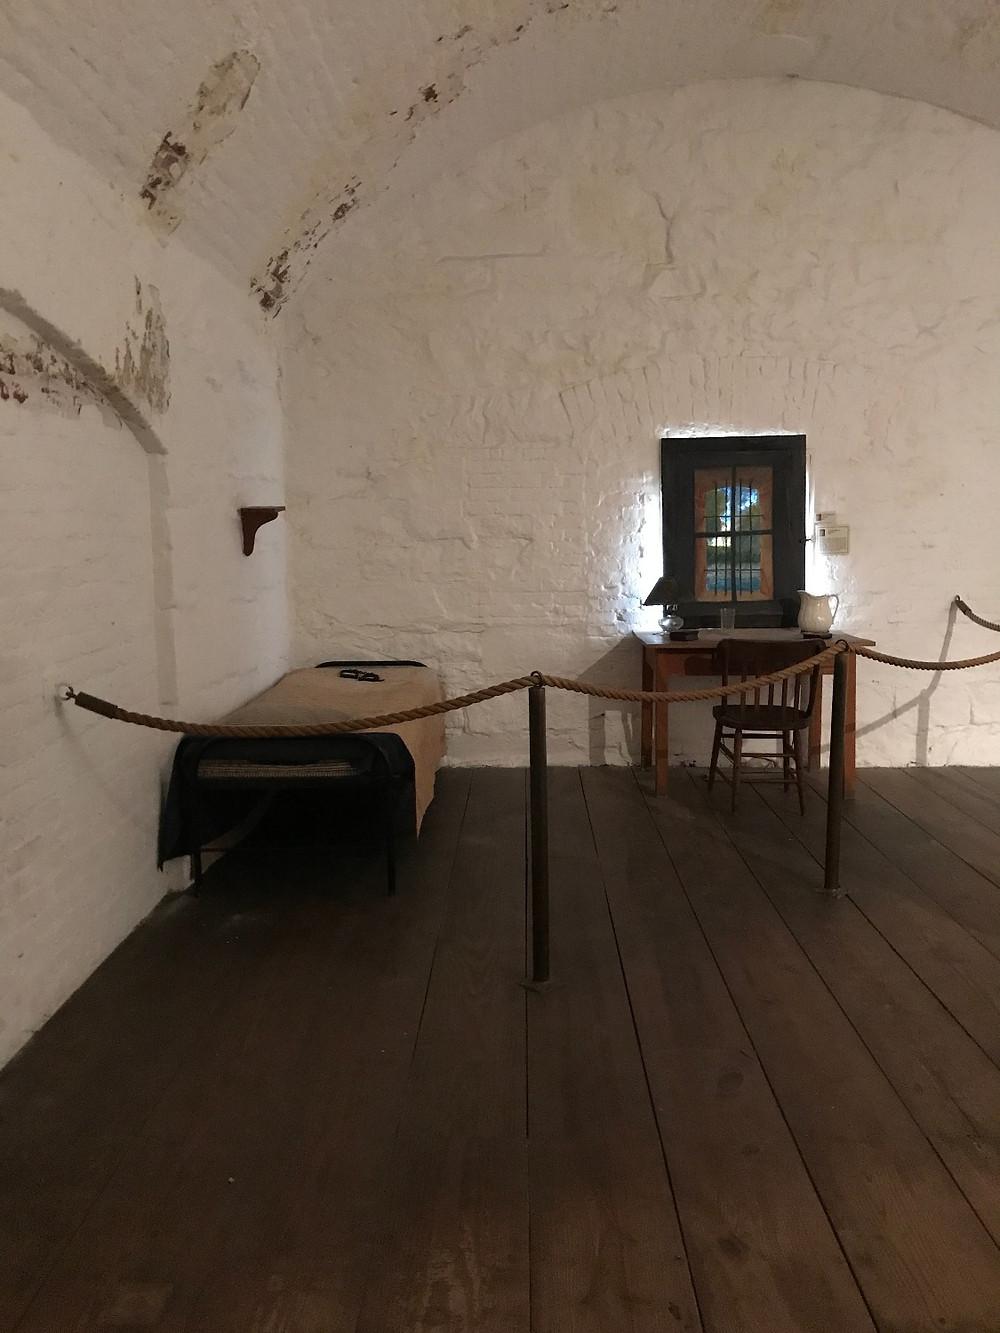 Inside of Jefferson Davis's cell